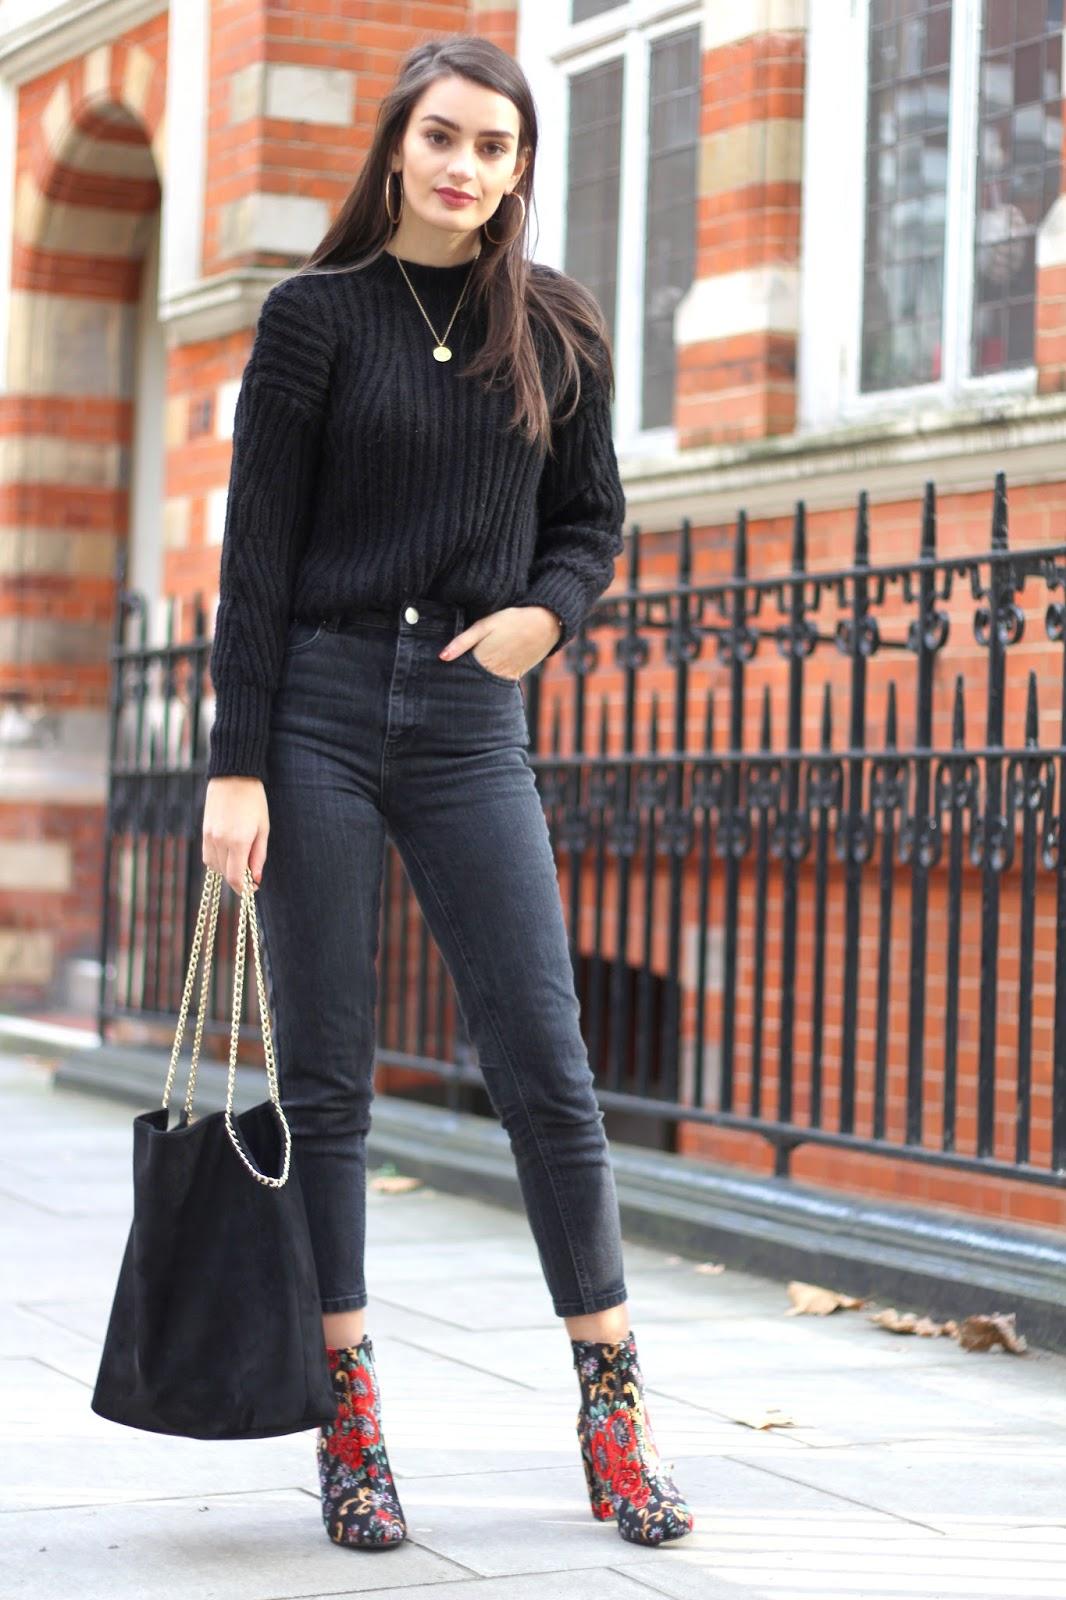 london peexo style blogger